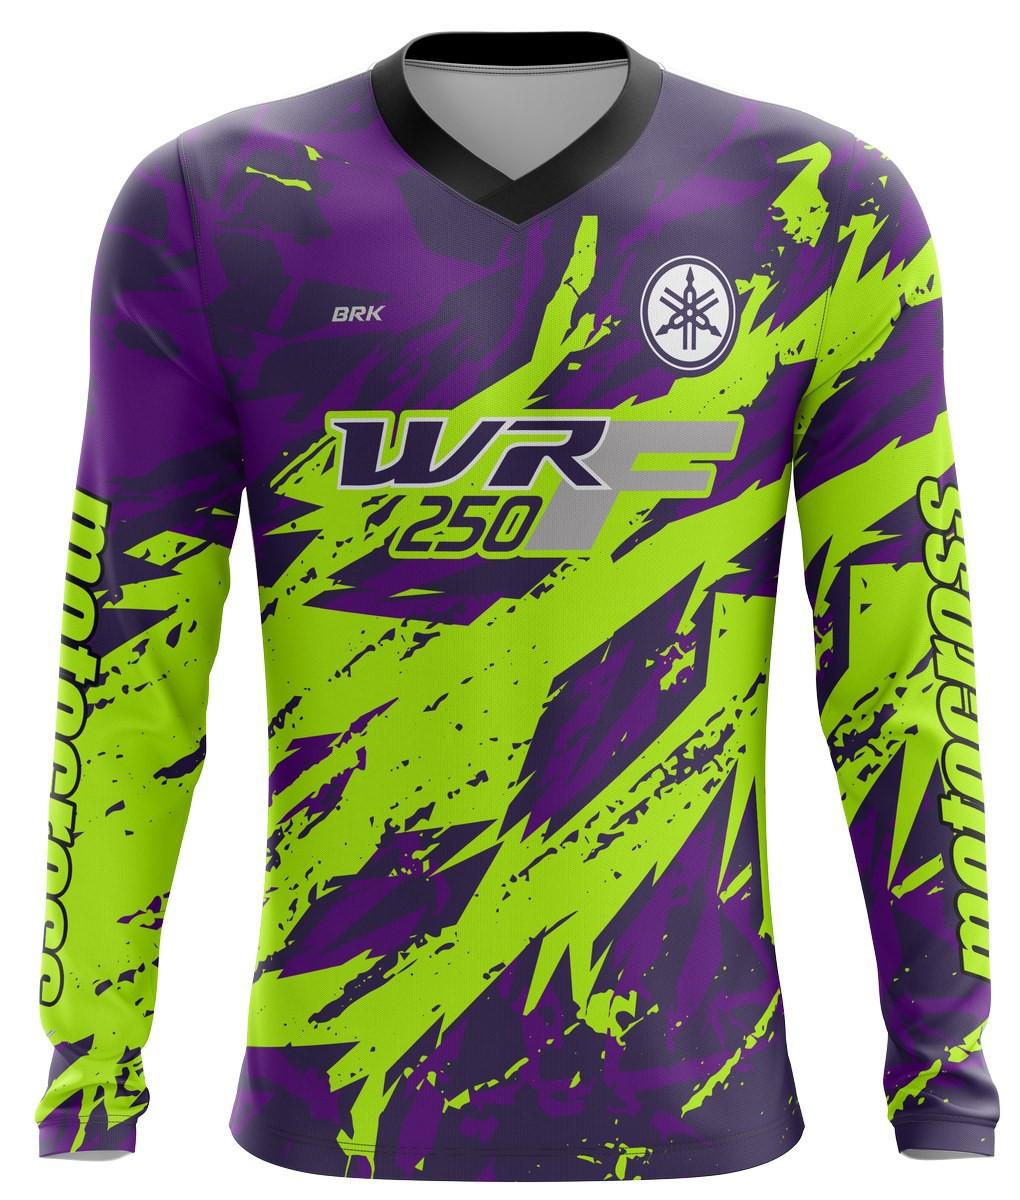 Camiseta Brk Motocross Yamaha WRF 250 com fps 50+